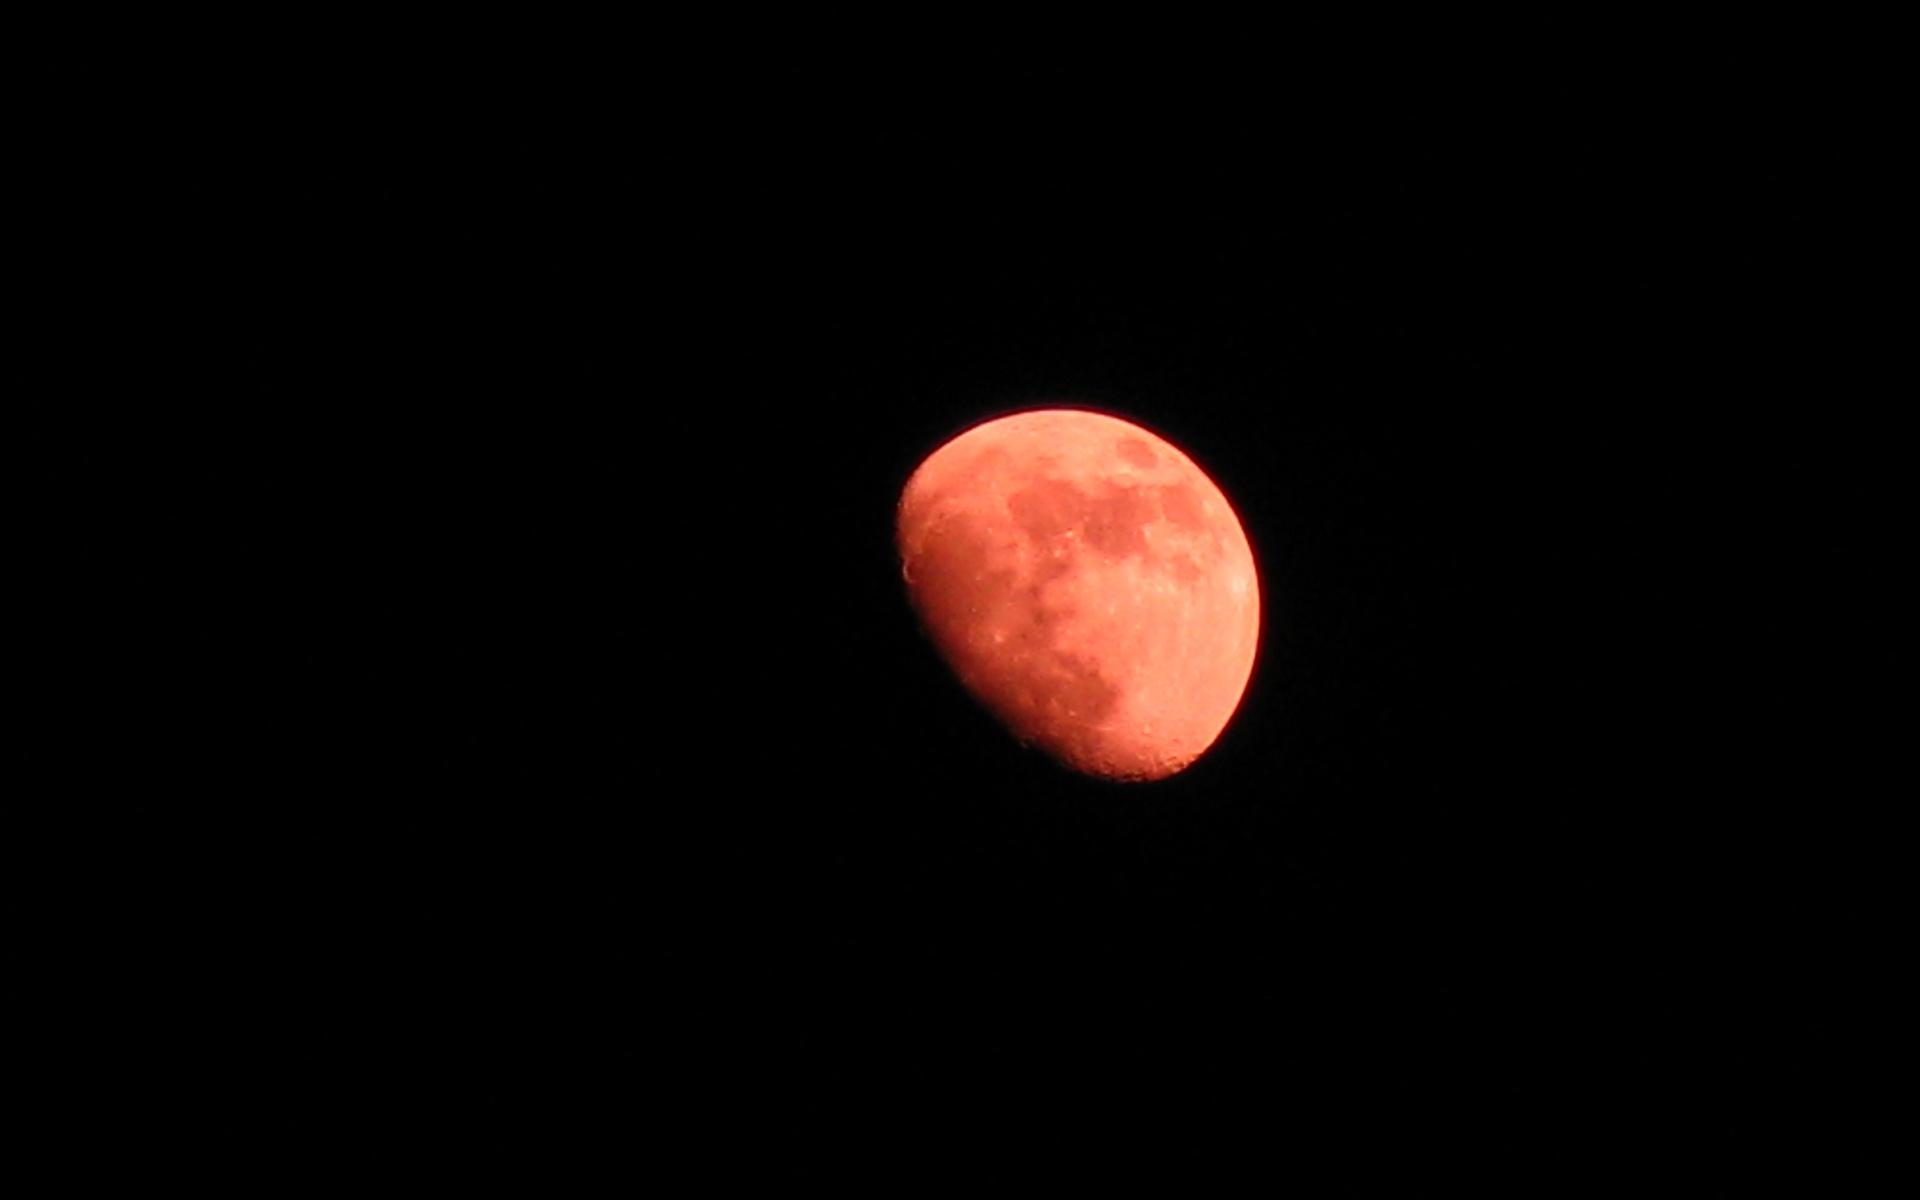 Red Moon Wallpaper: Red Moon Wallpaper